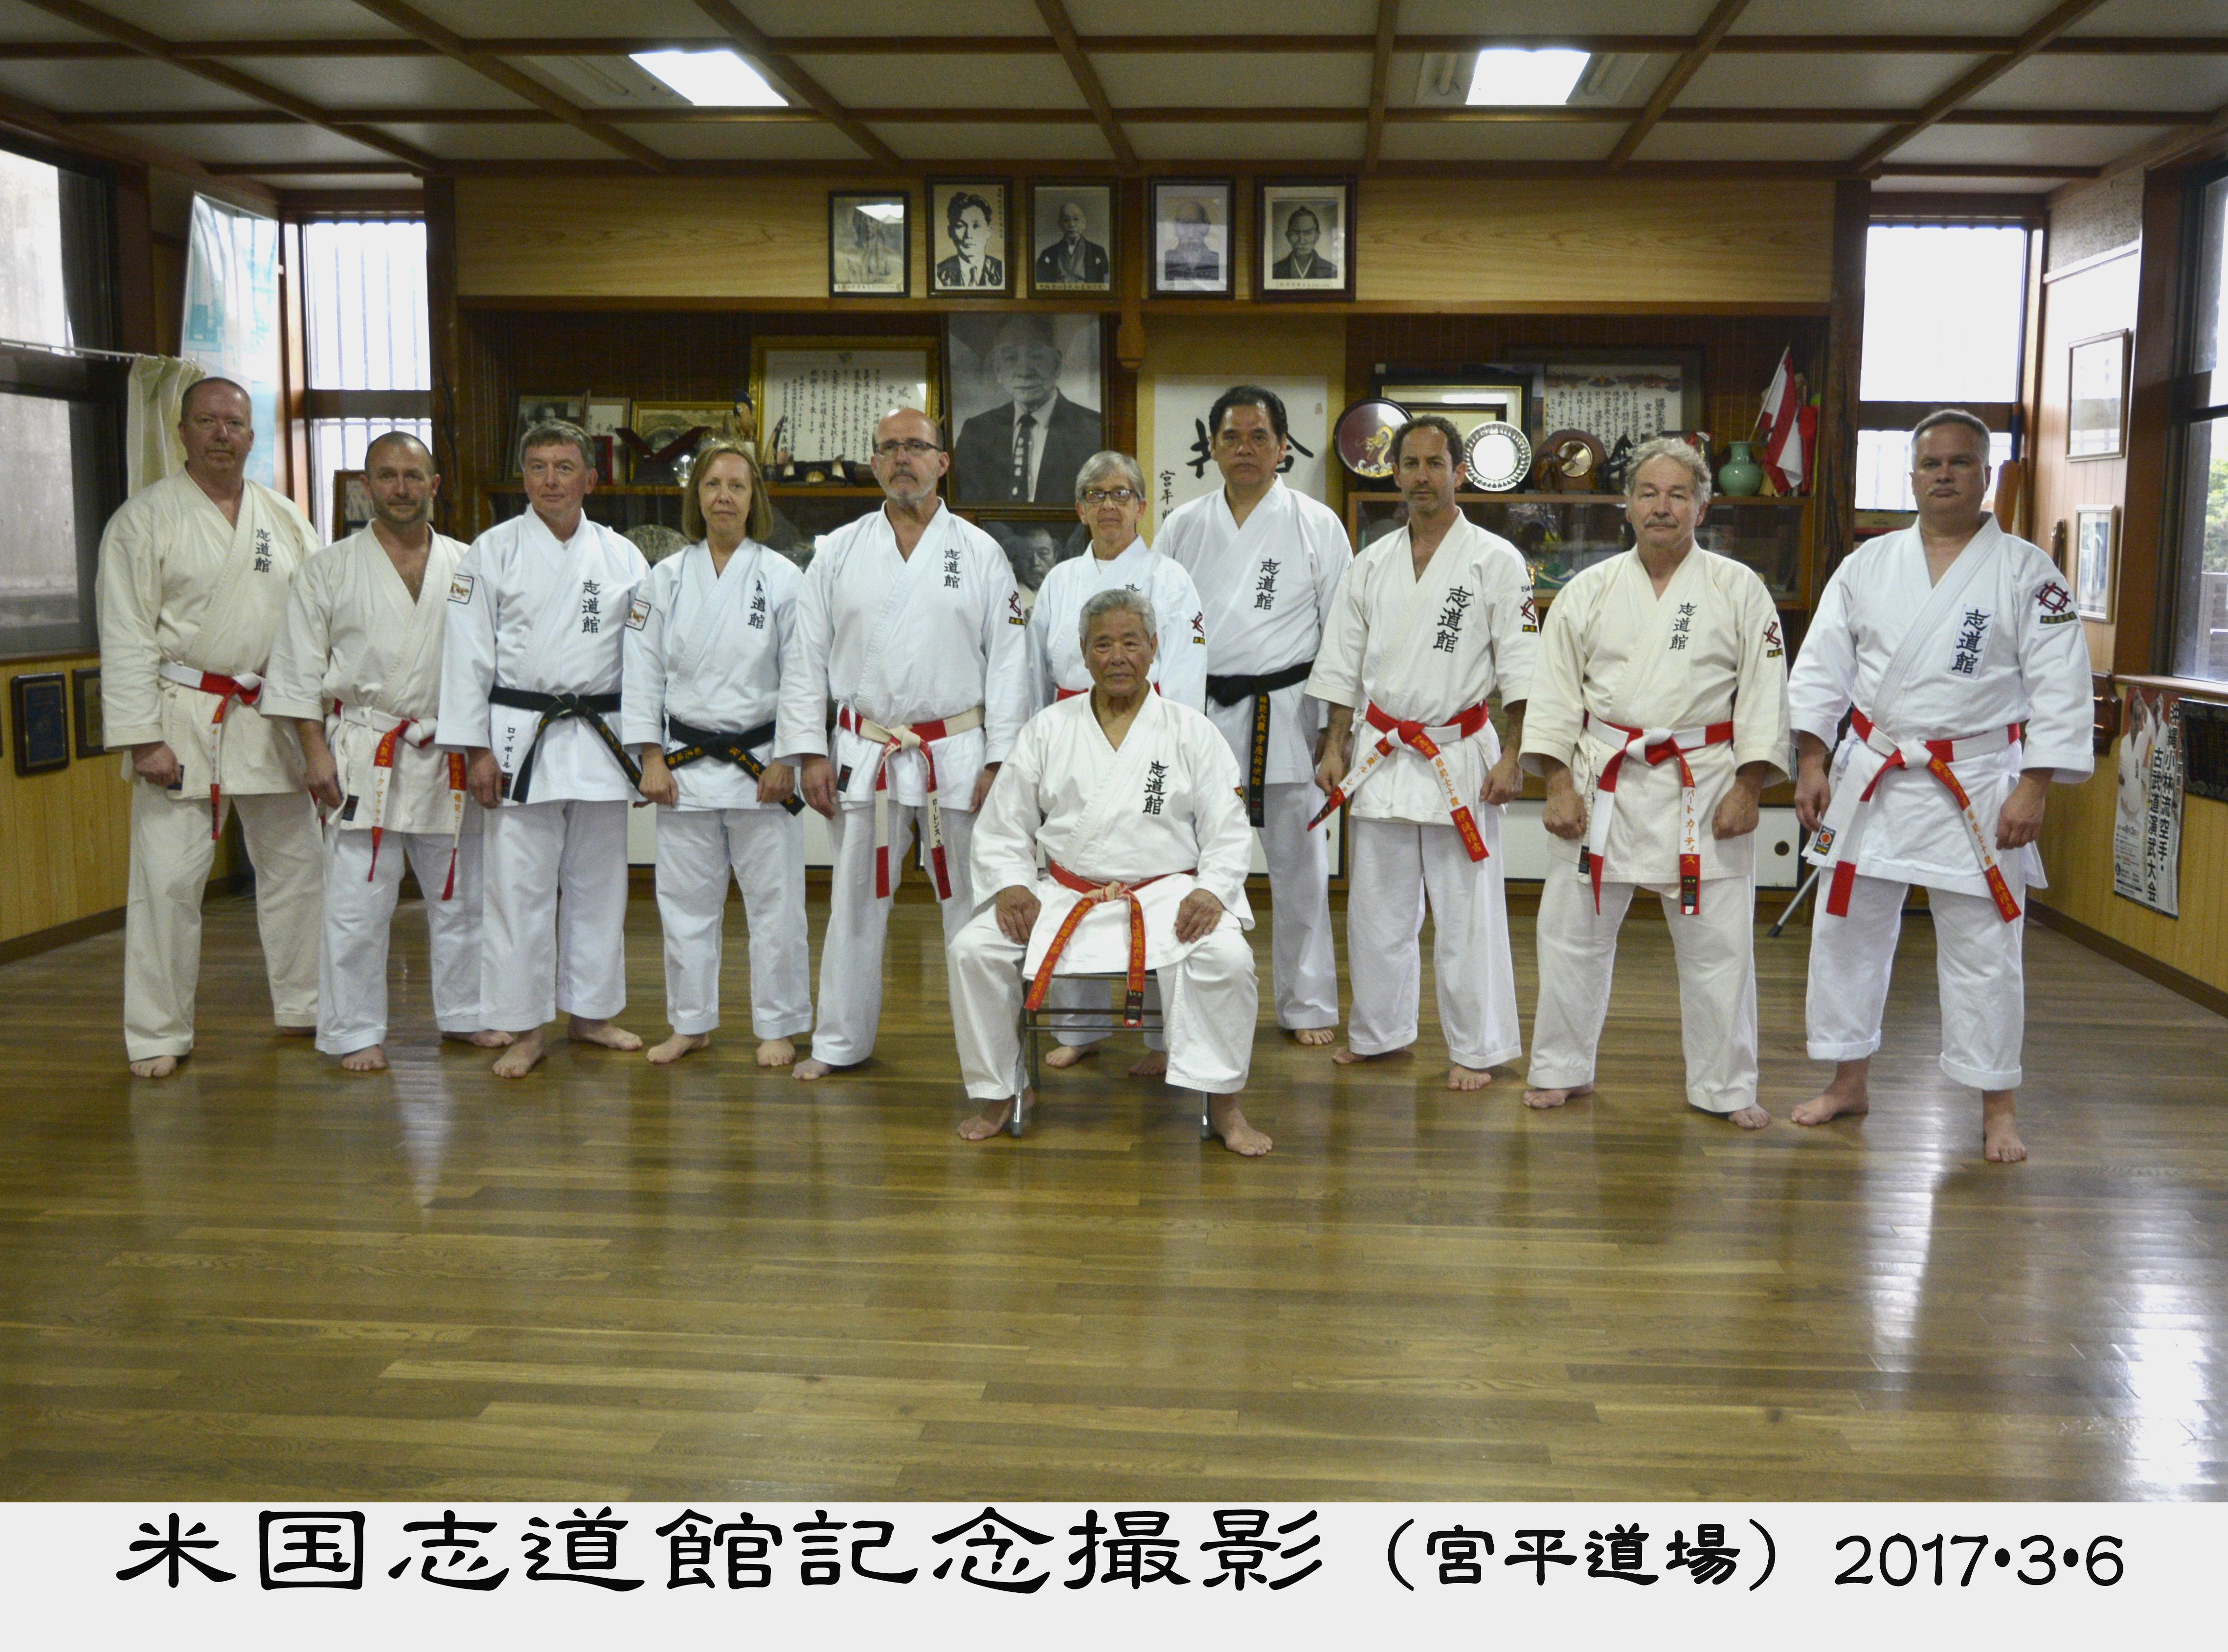 Katsuya Miyahira's Shidokan Dojo with Seikichi Iha, 10th Dan, Hanshi and some of his senior dojo instructors